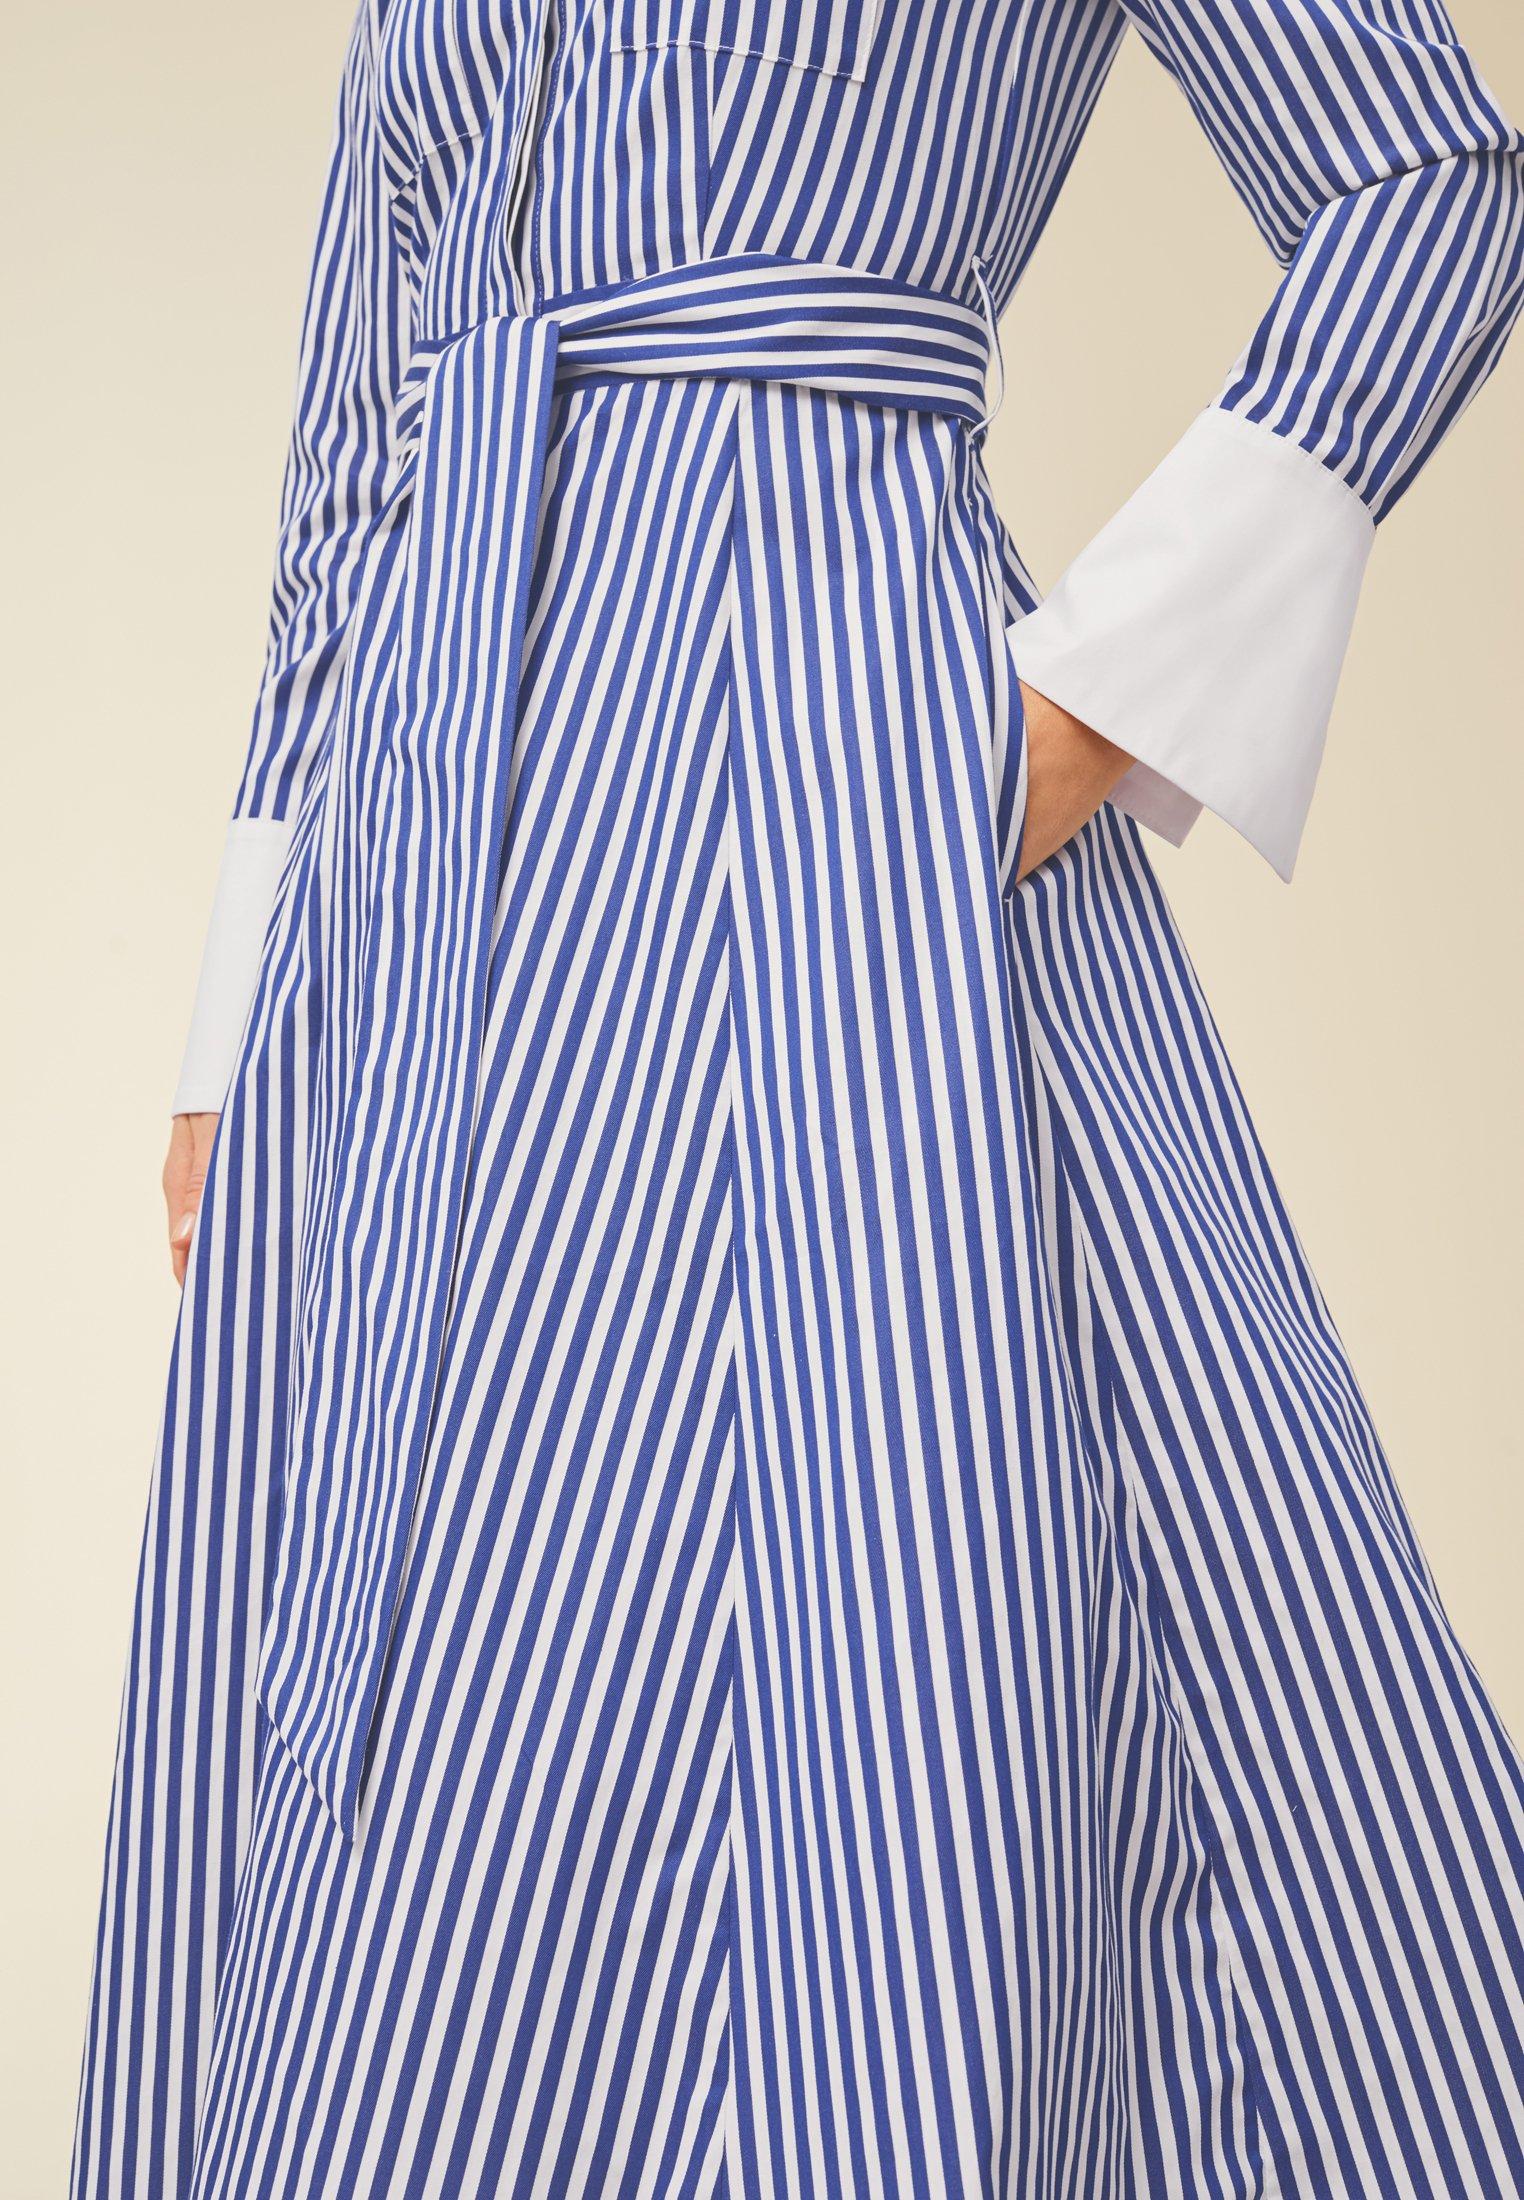 Popular Women's Clothing IVY & OAK Shirt dress stripe illuminate blue xsSl3TJLV